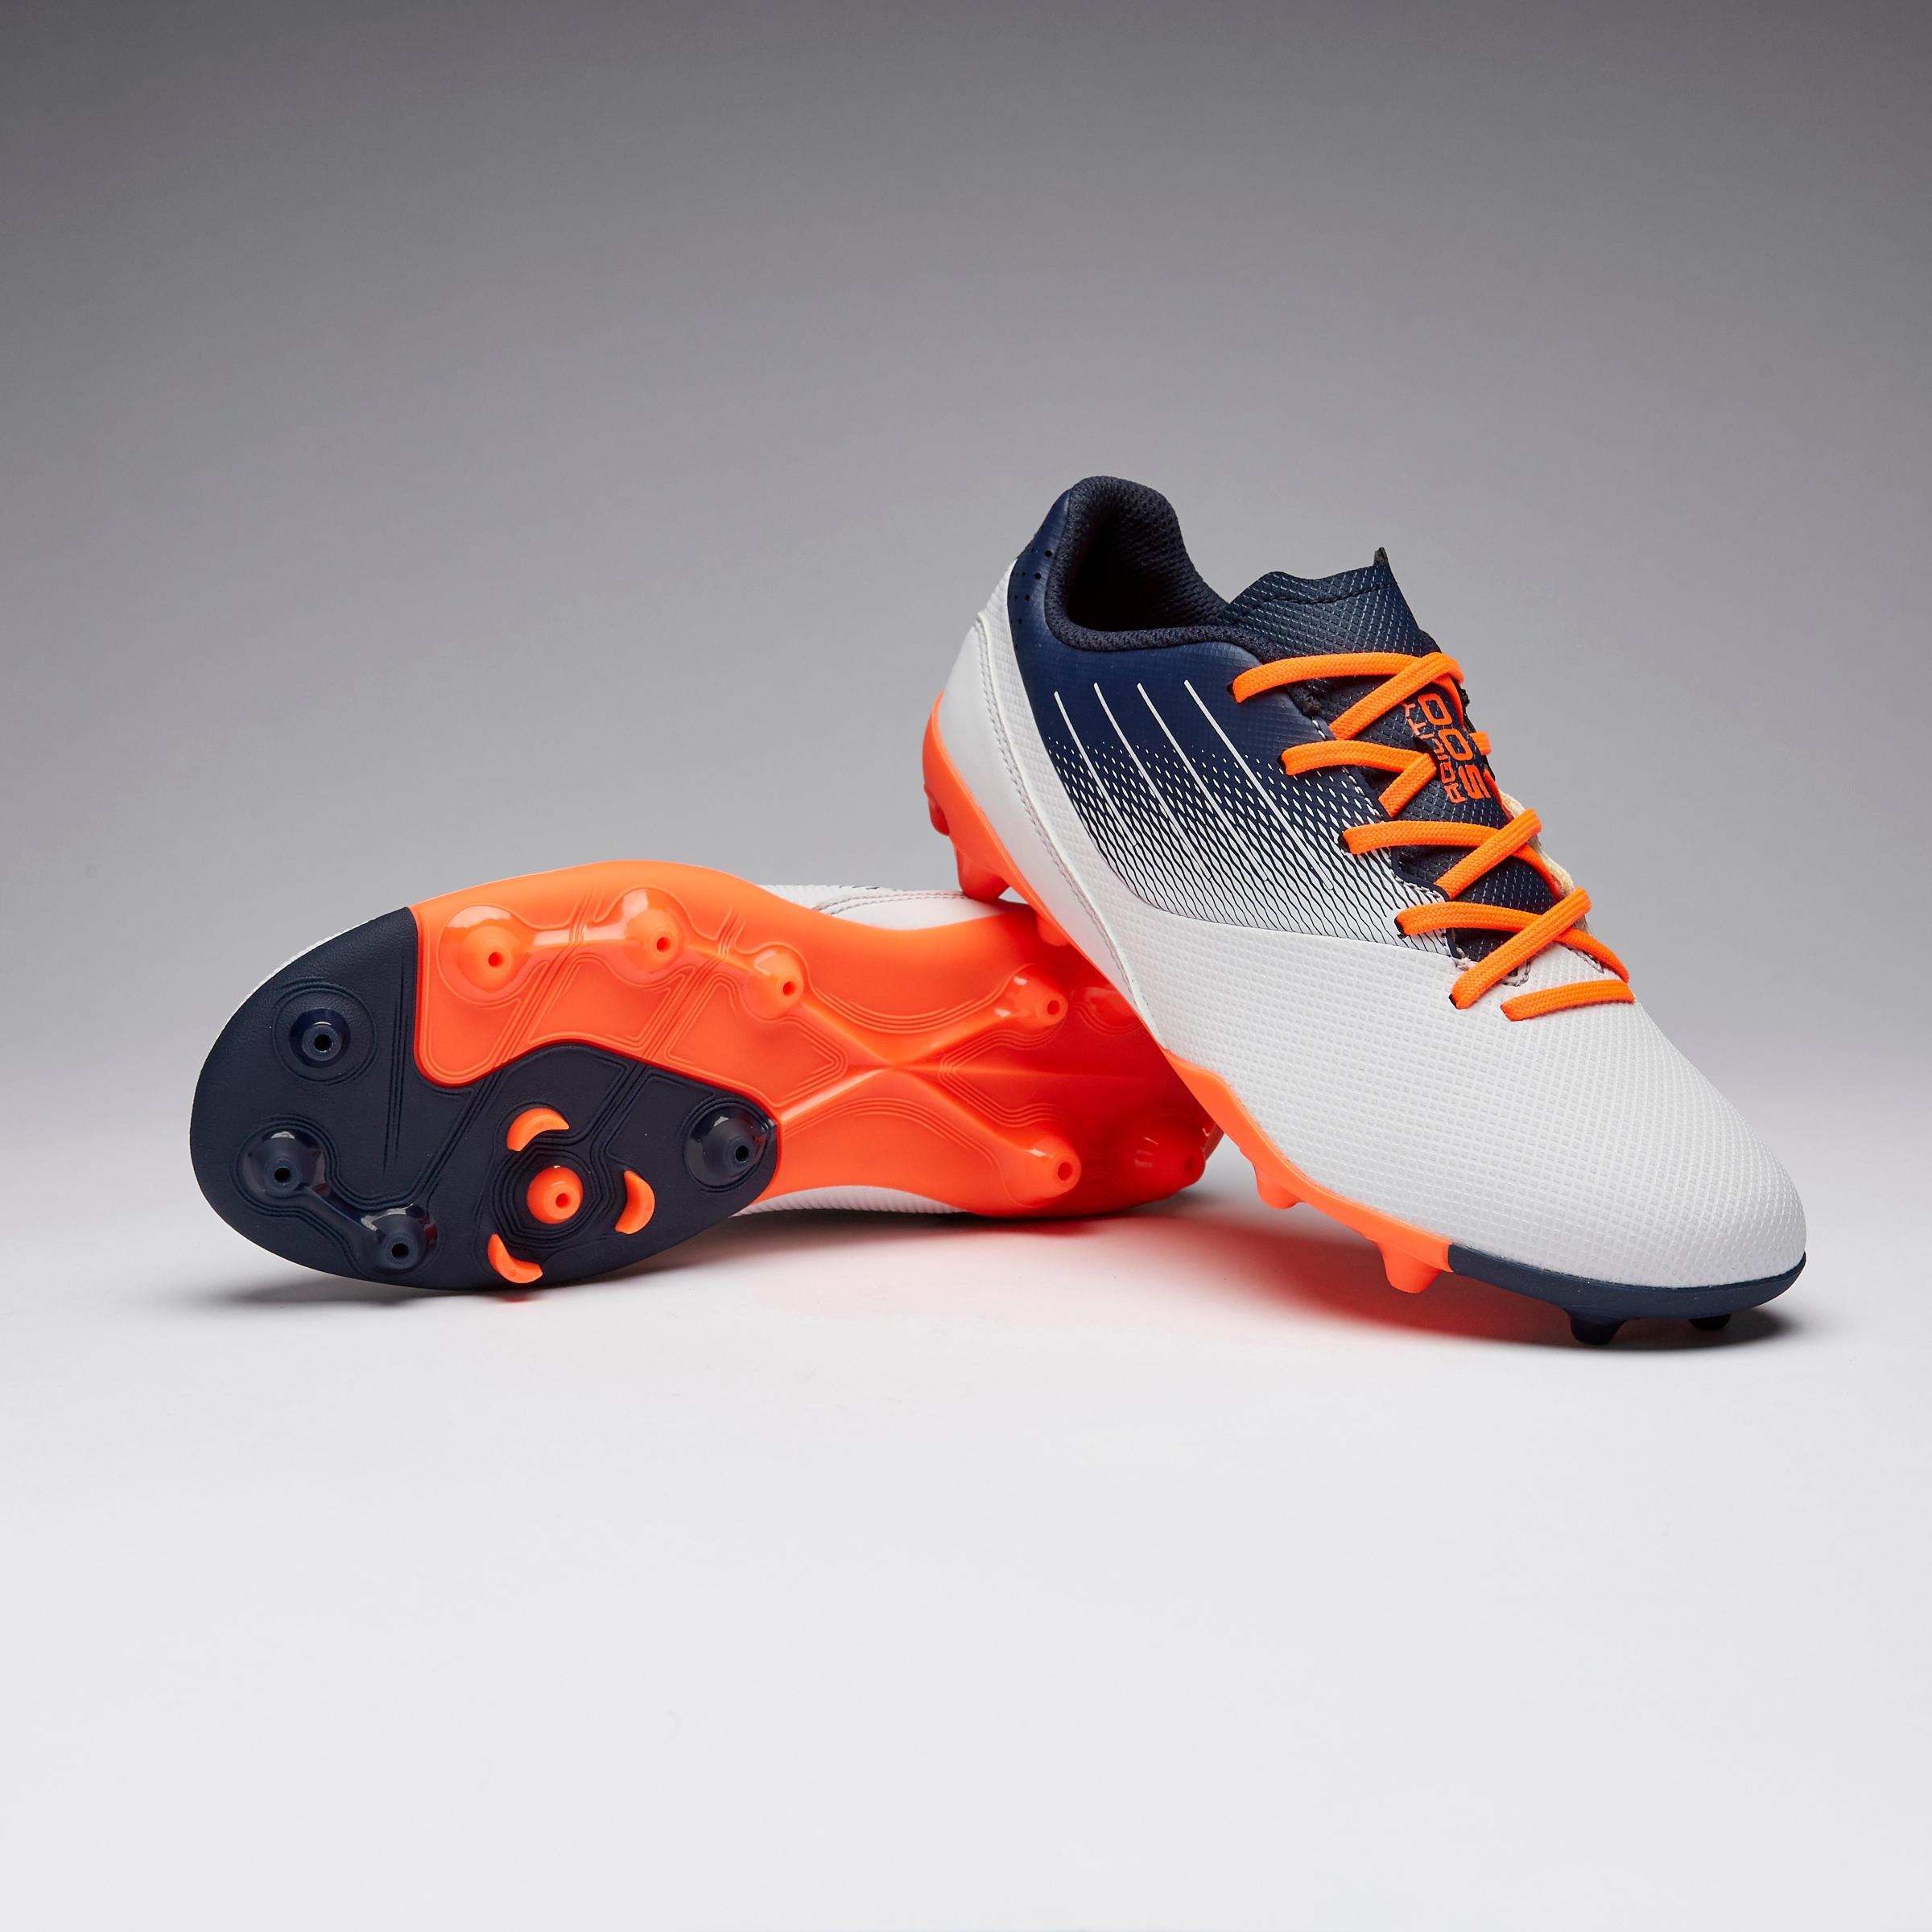 Kipsta Football Shoes - Football Boots